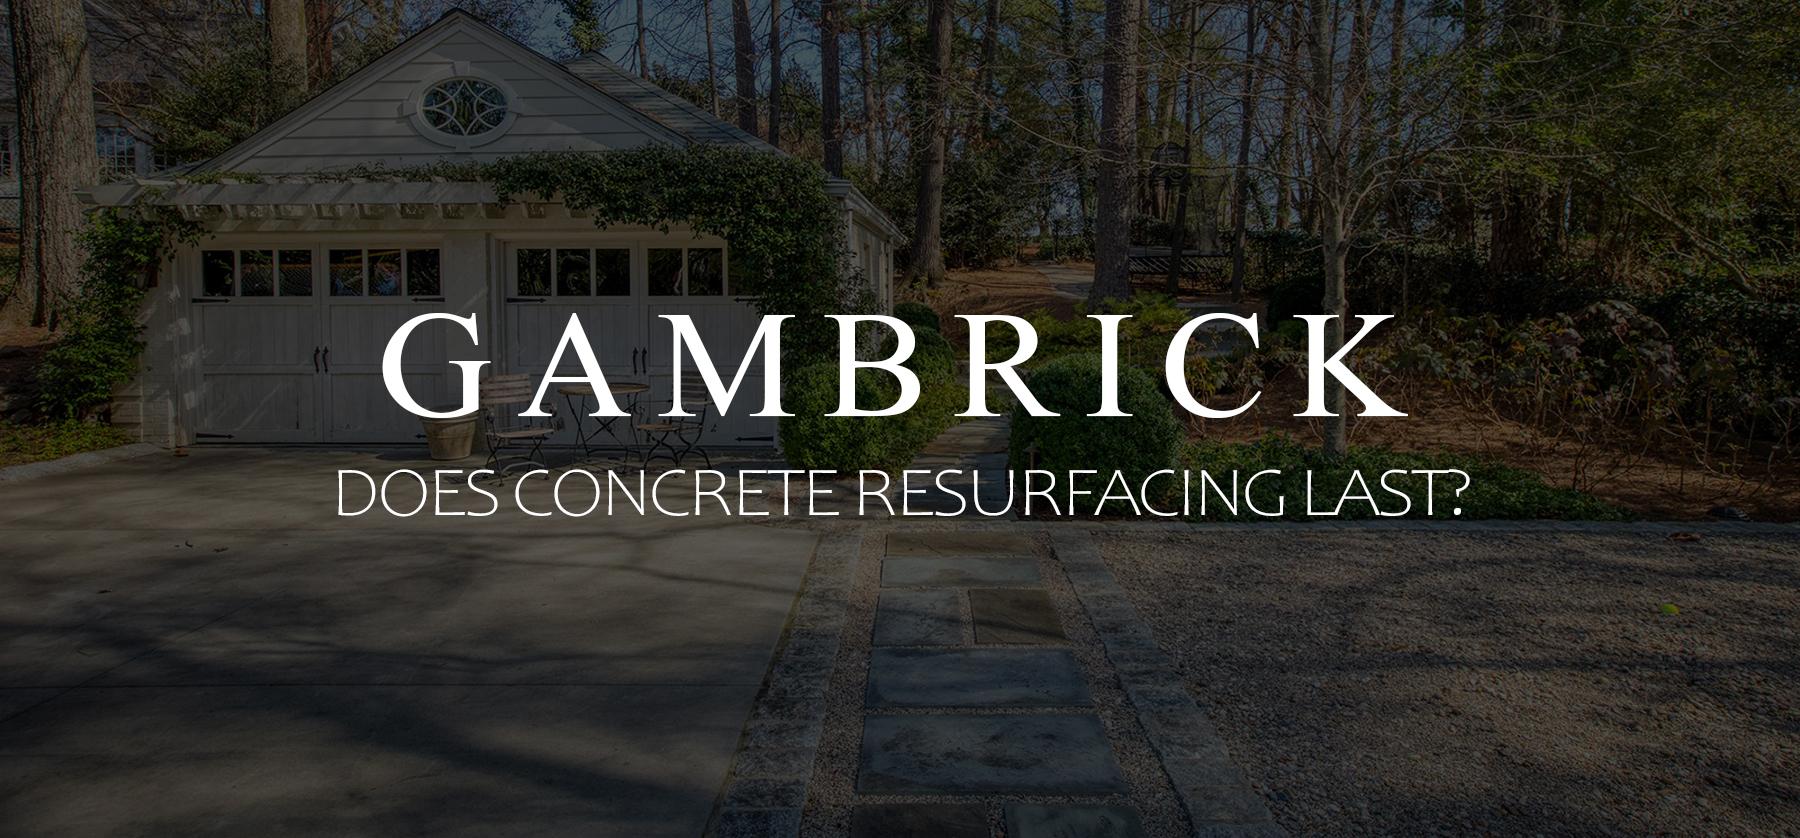 does concrete resurfacing last banner 1